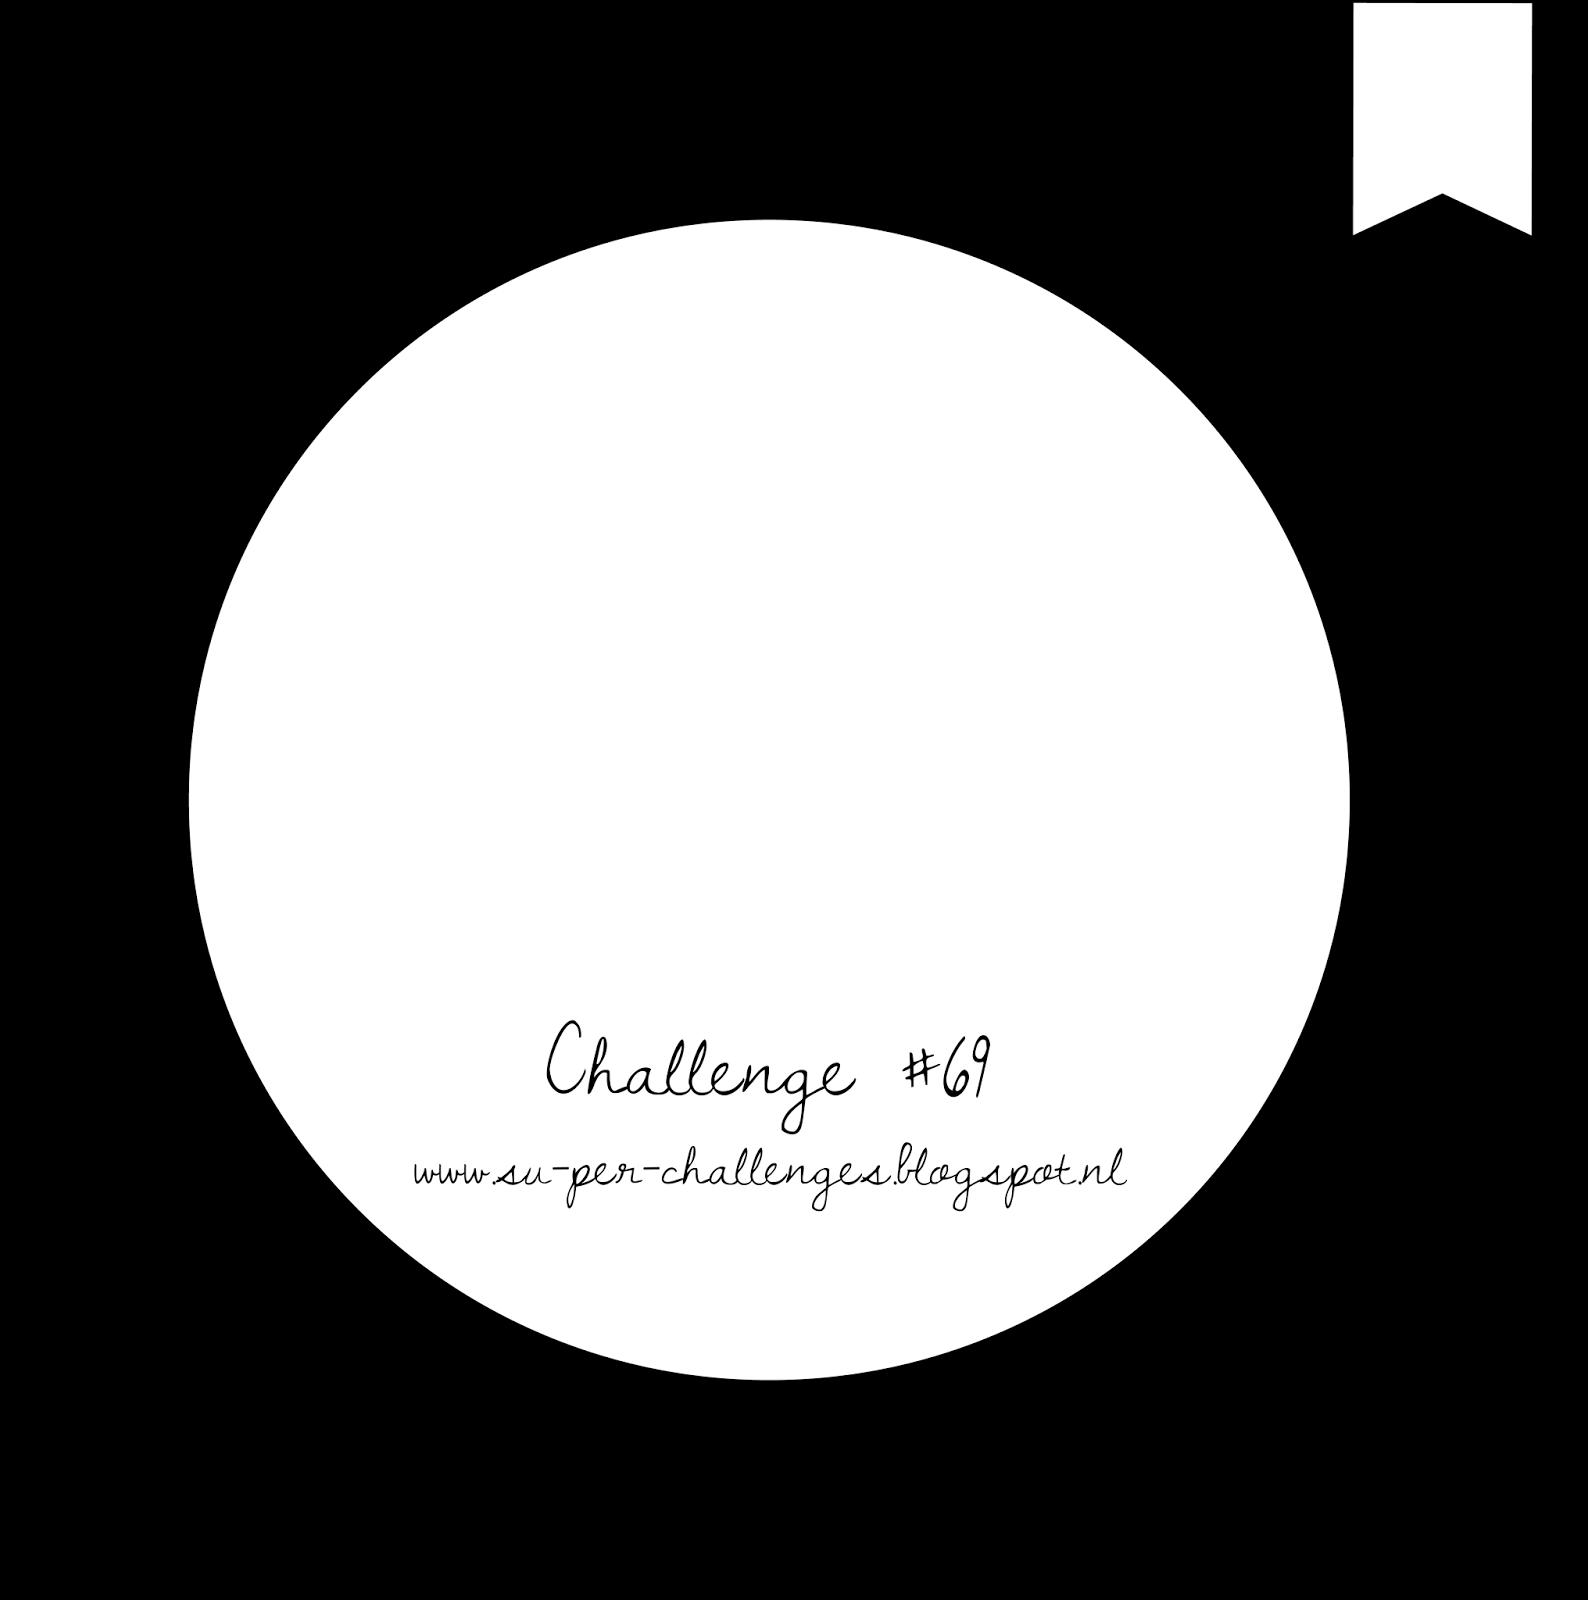 http://su-per-challenges.blogspot.nl/2014/12/challenge-69-sketch.html